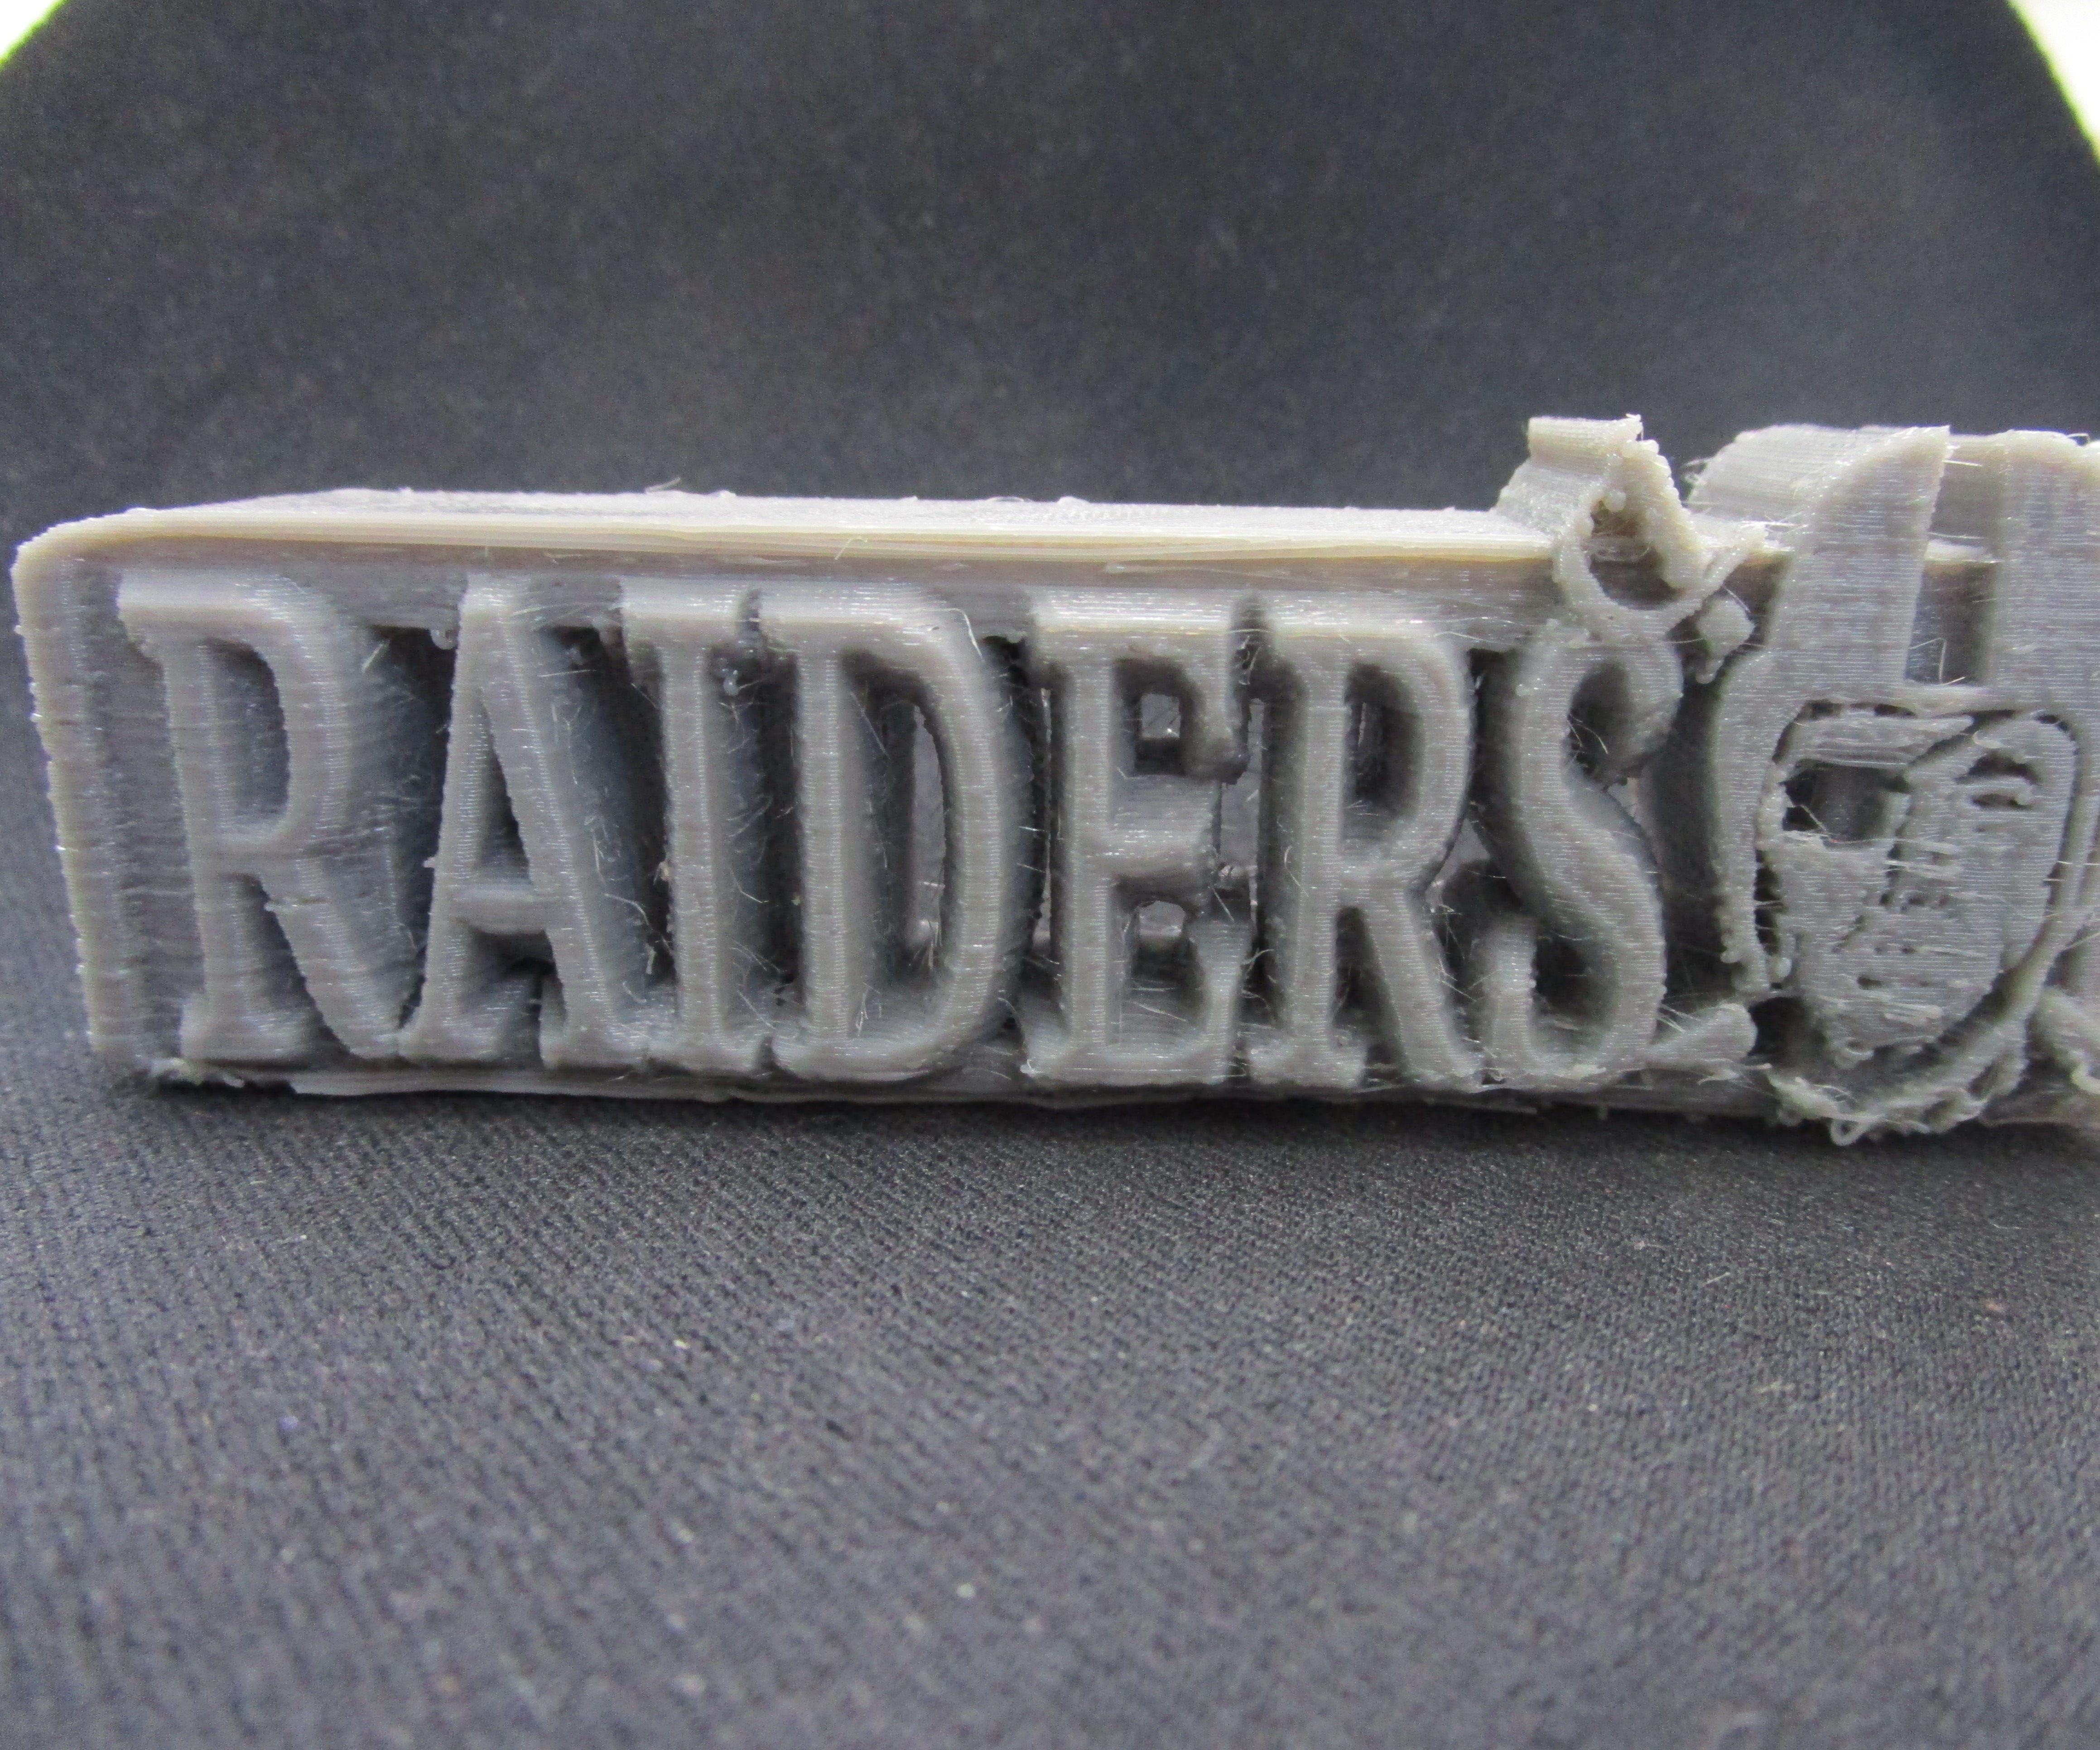 Raiders Fan Logo Desk Ornament